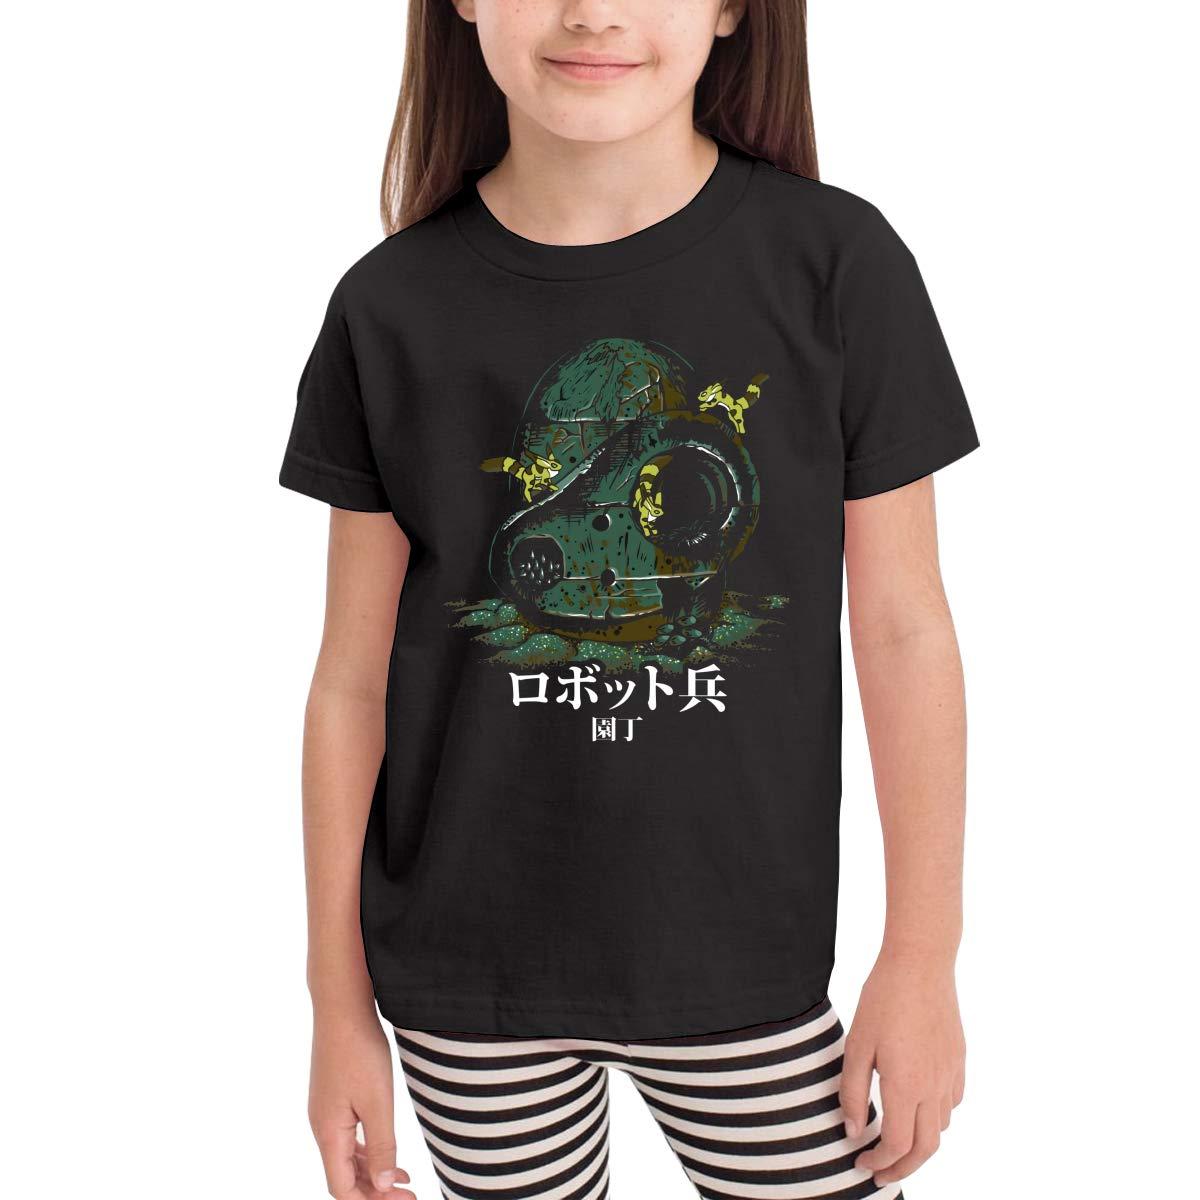 WYeter Castle in The Sky Laputa Infant Kids Classic Short Sleeve Tshirt Black